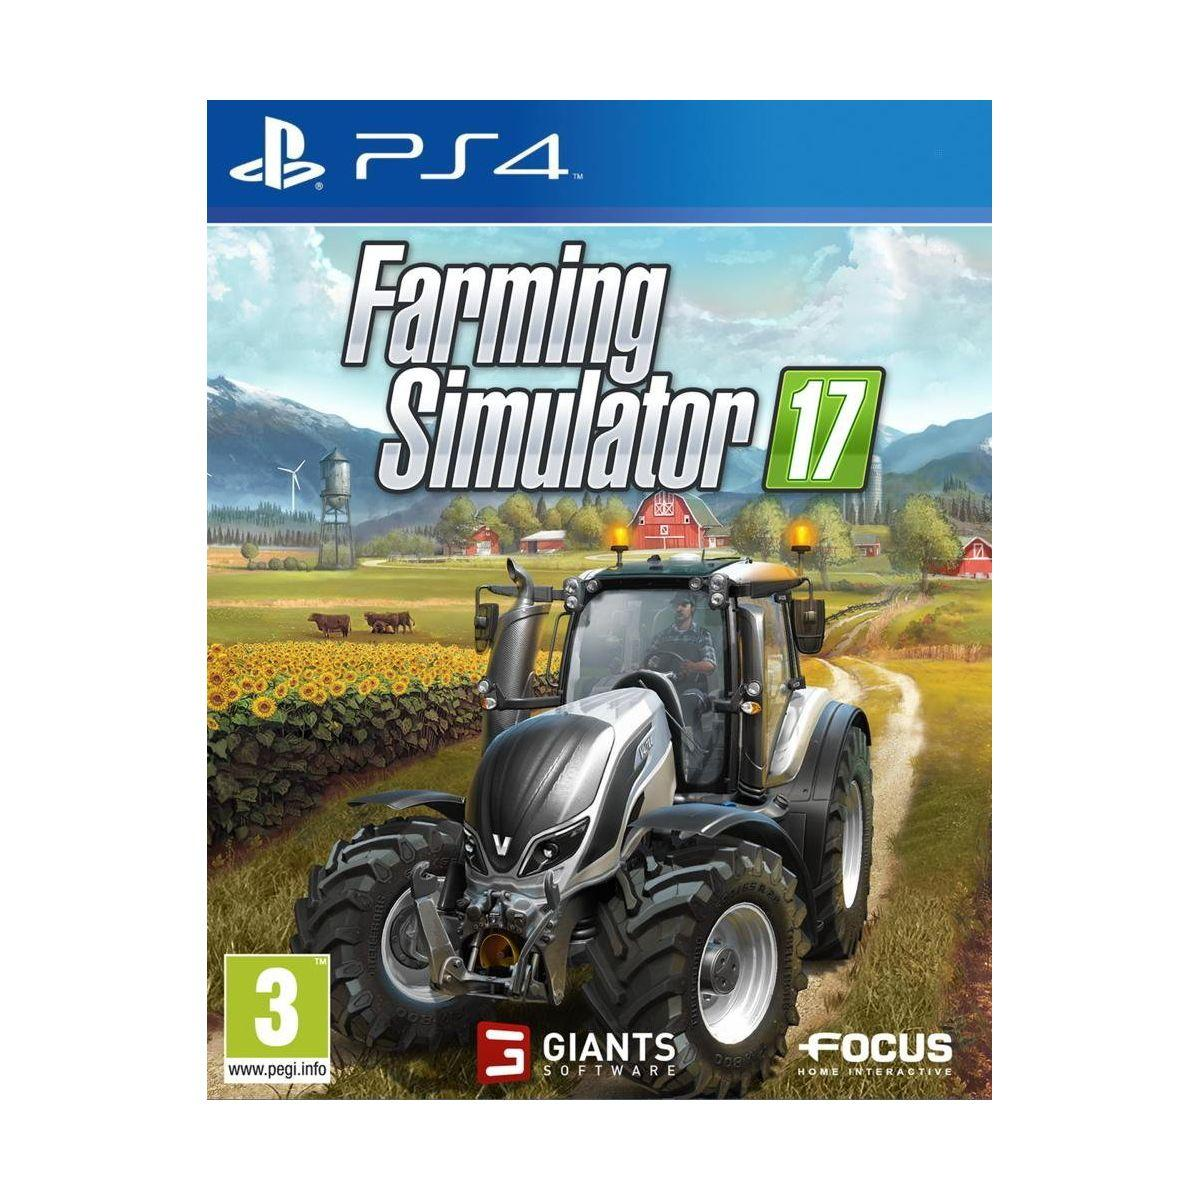 Jeu ps4 focus farming simulator 2017 (photo)